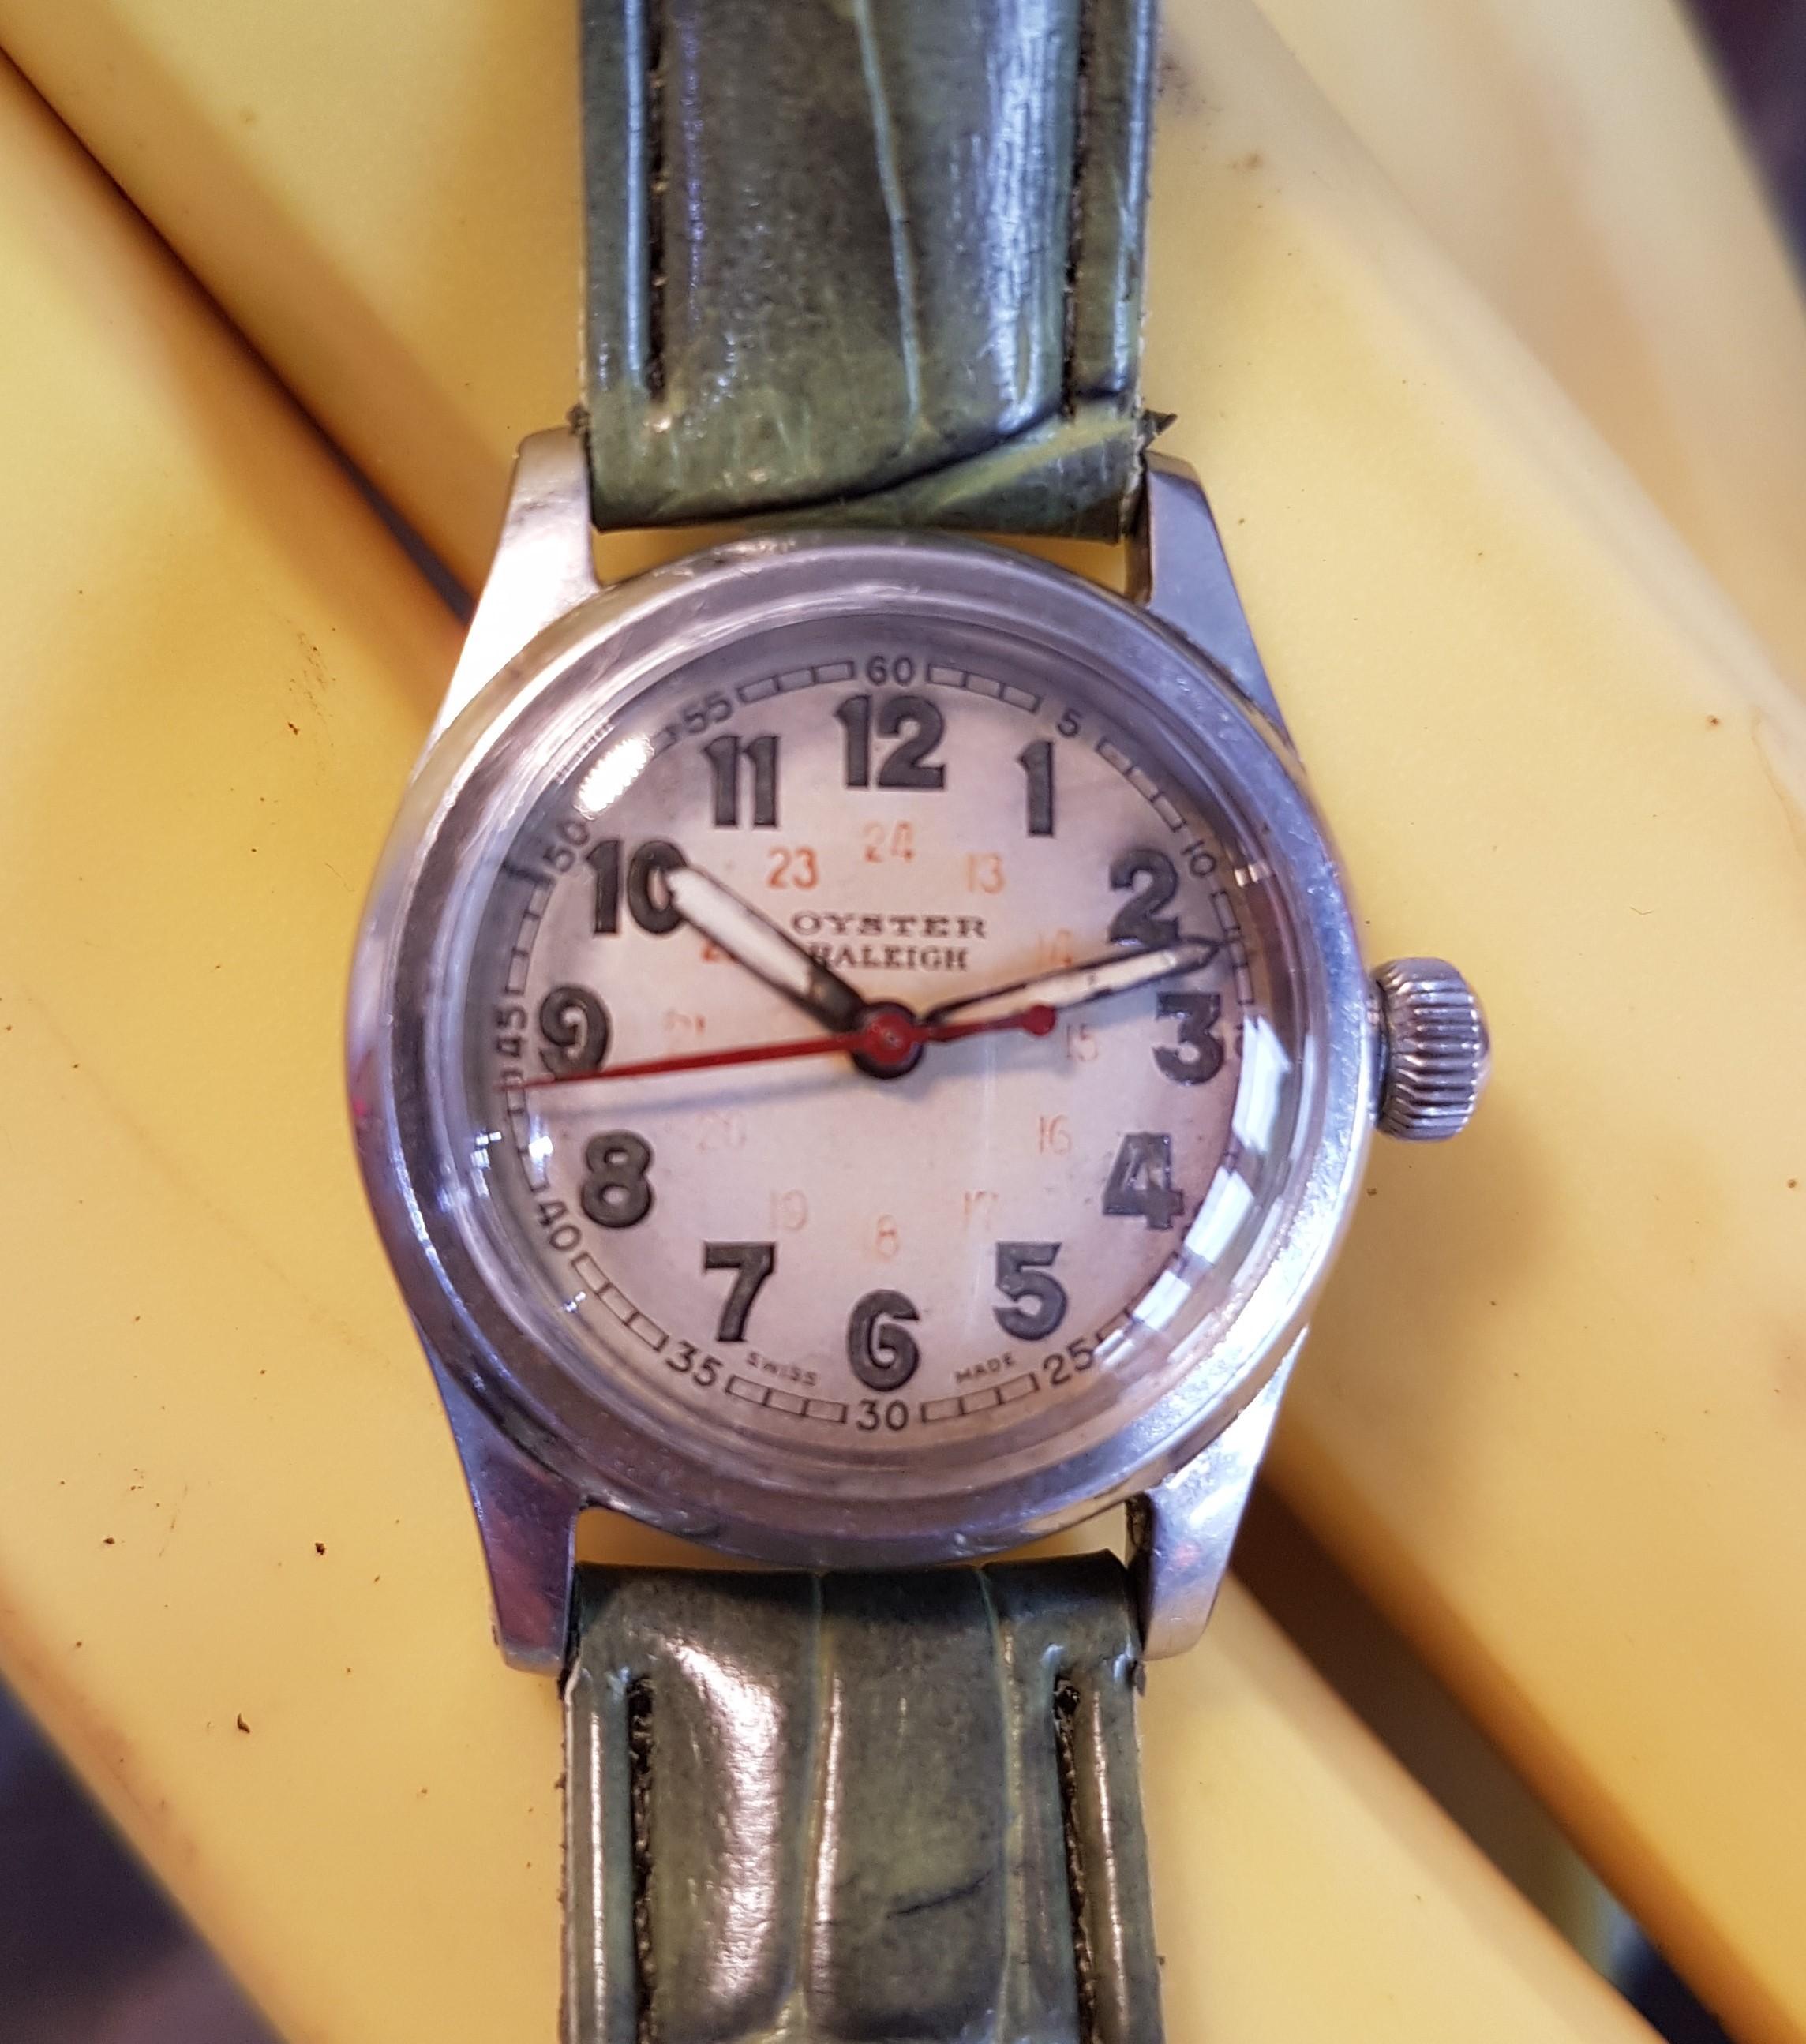 Sold 1940 rolex oyster raleigh birth year watches homesold 1940 rolex oyster raleigh aiddatafo Gallery